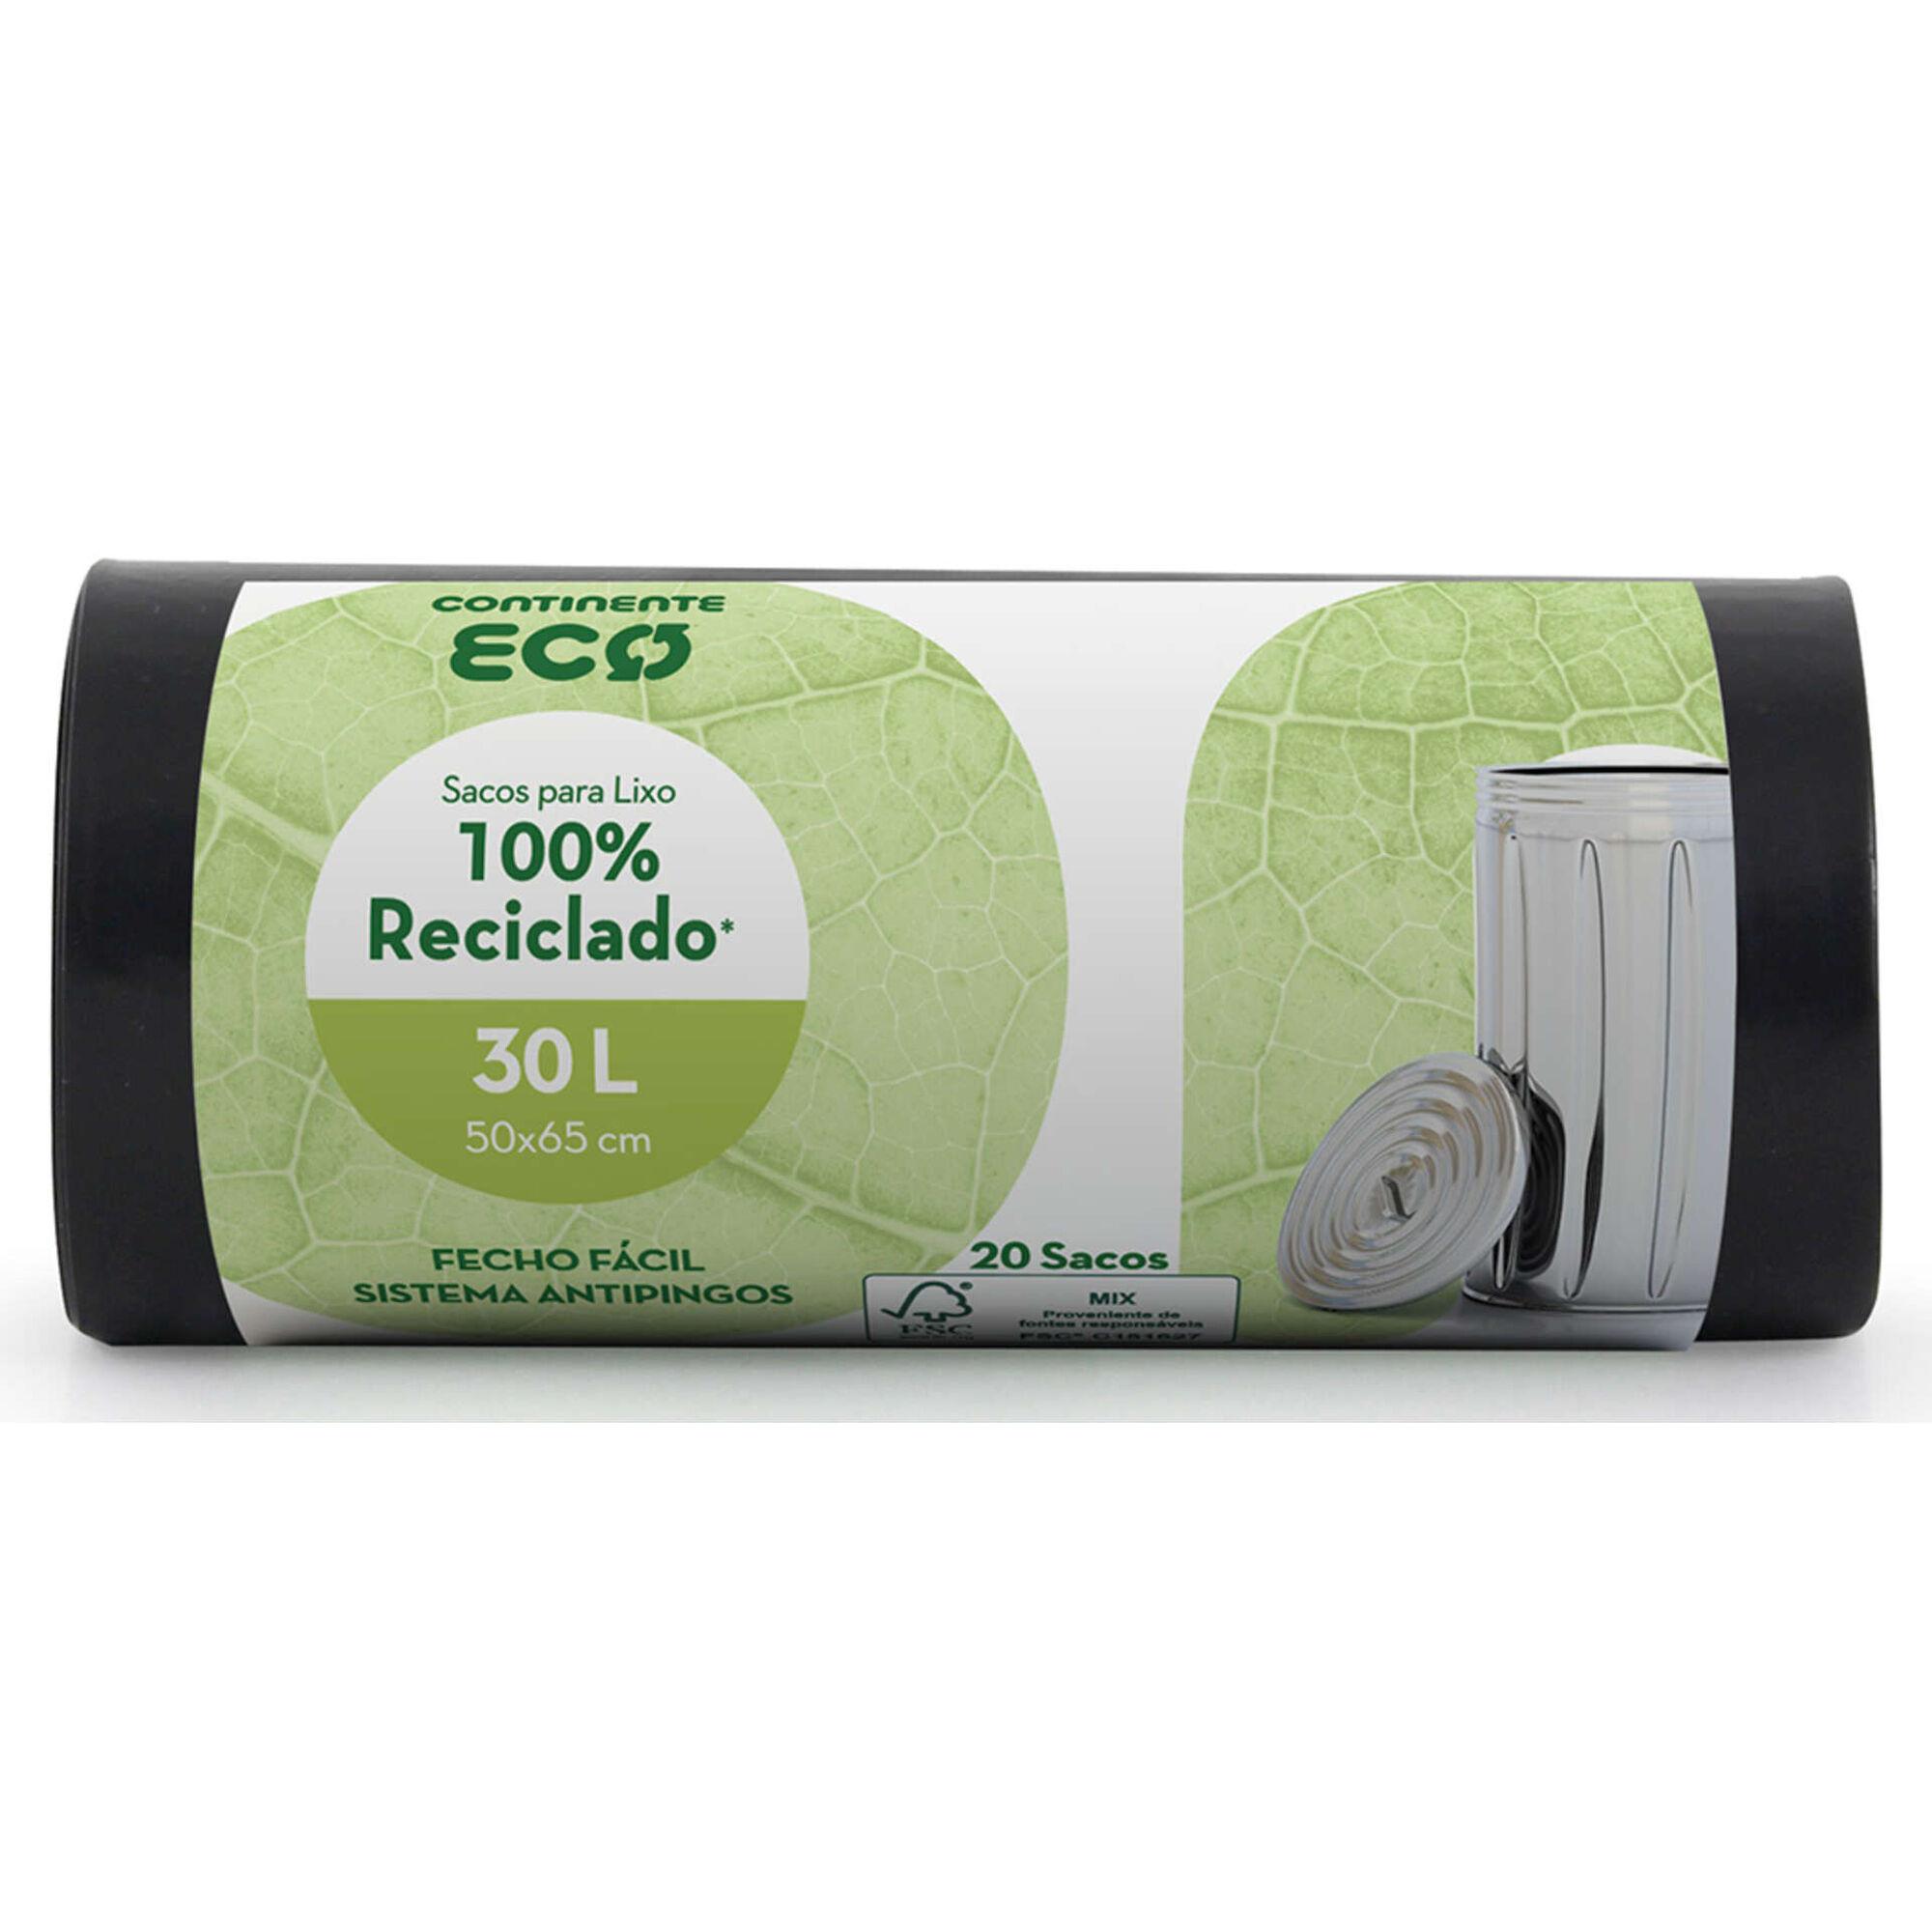 Sacos Lixo 100% Reciclado Fecho Fácil 30 lt